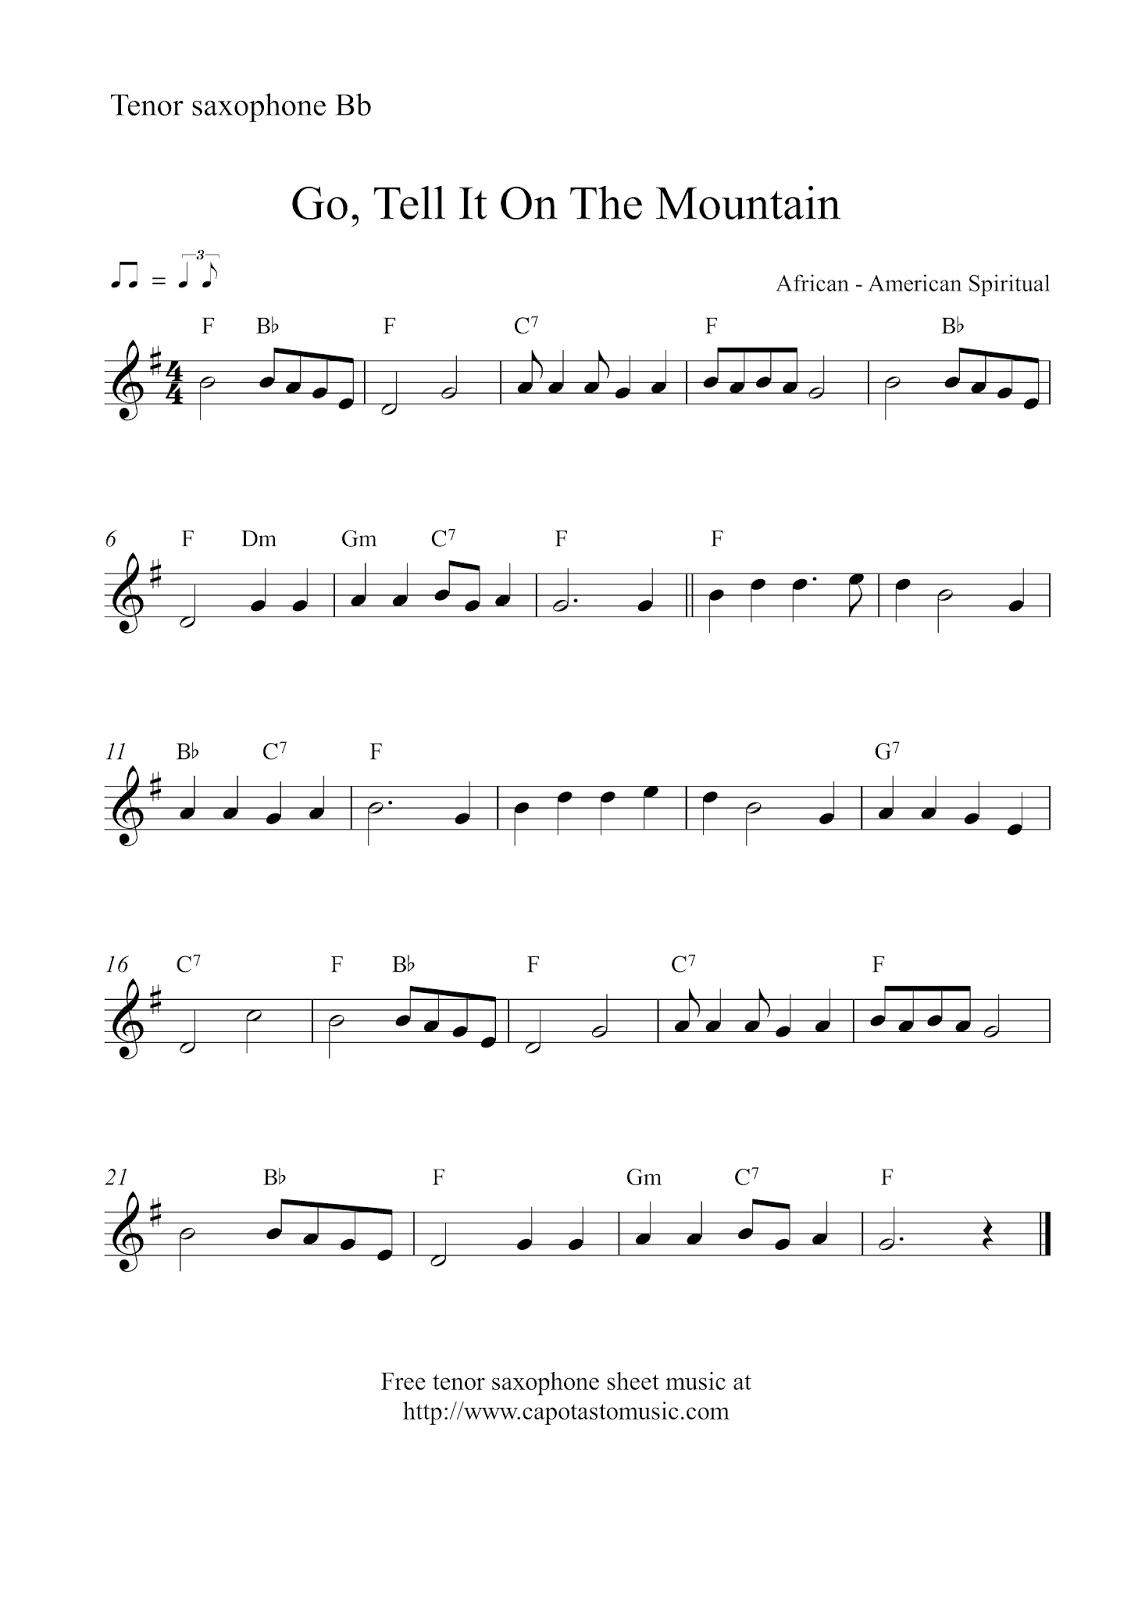 Free Christmas tenor saxophone sheet music - Go, Tell It On The Mountain